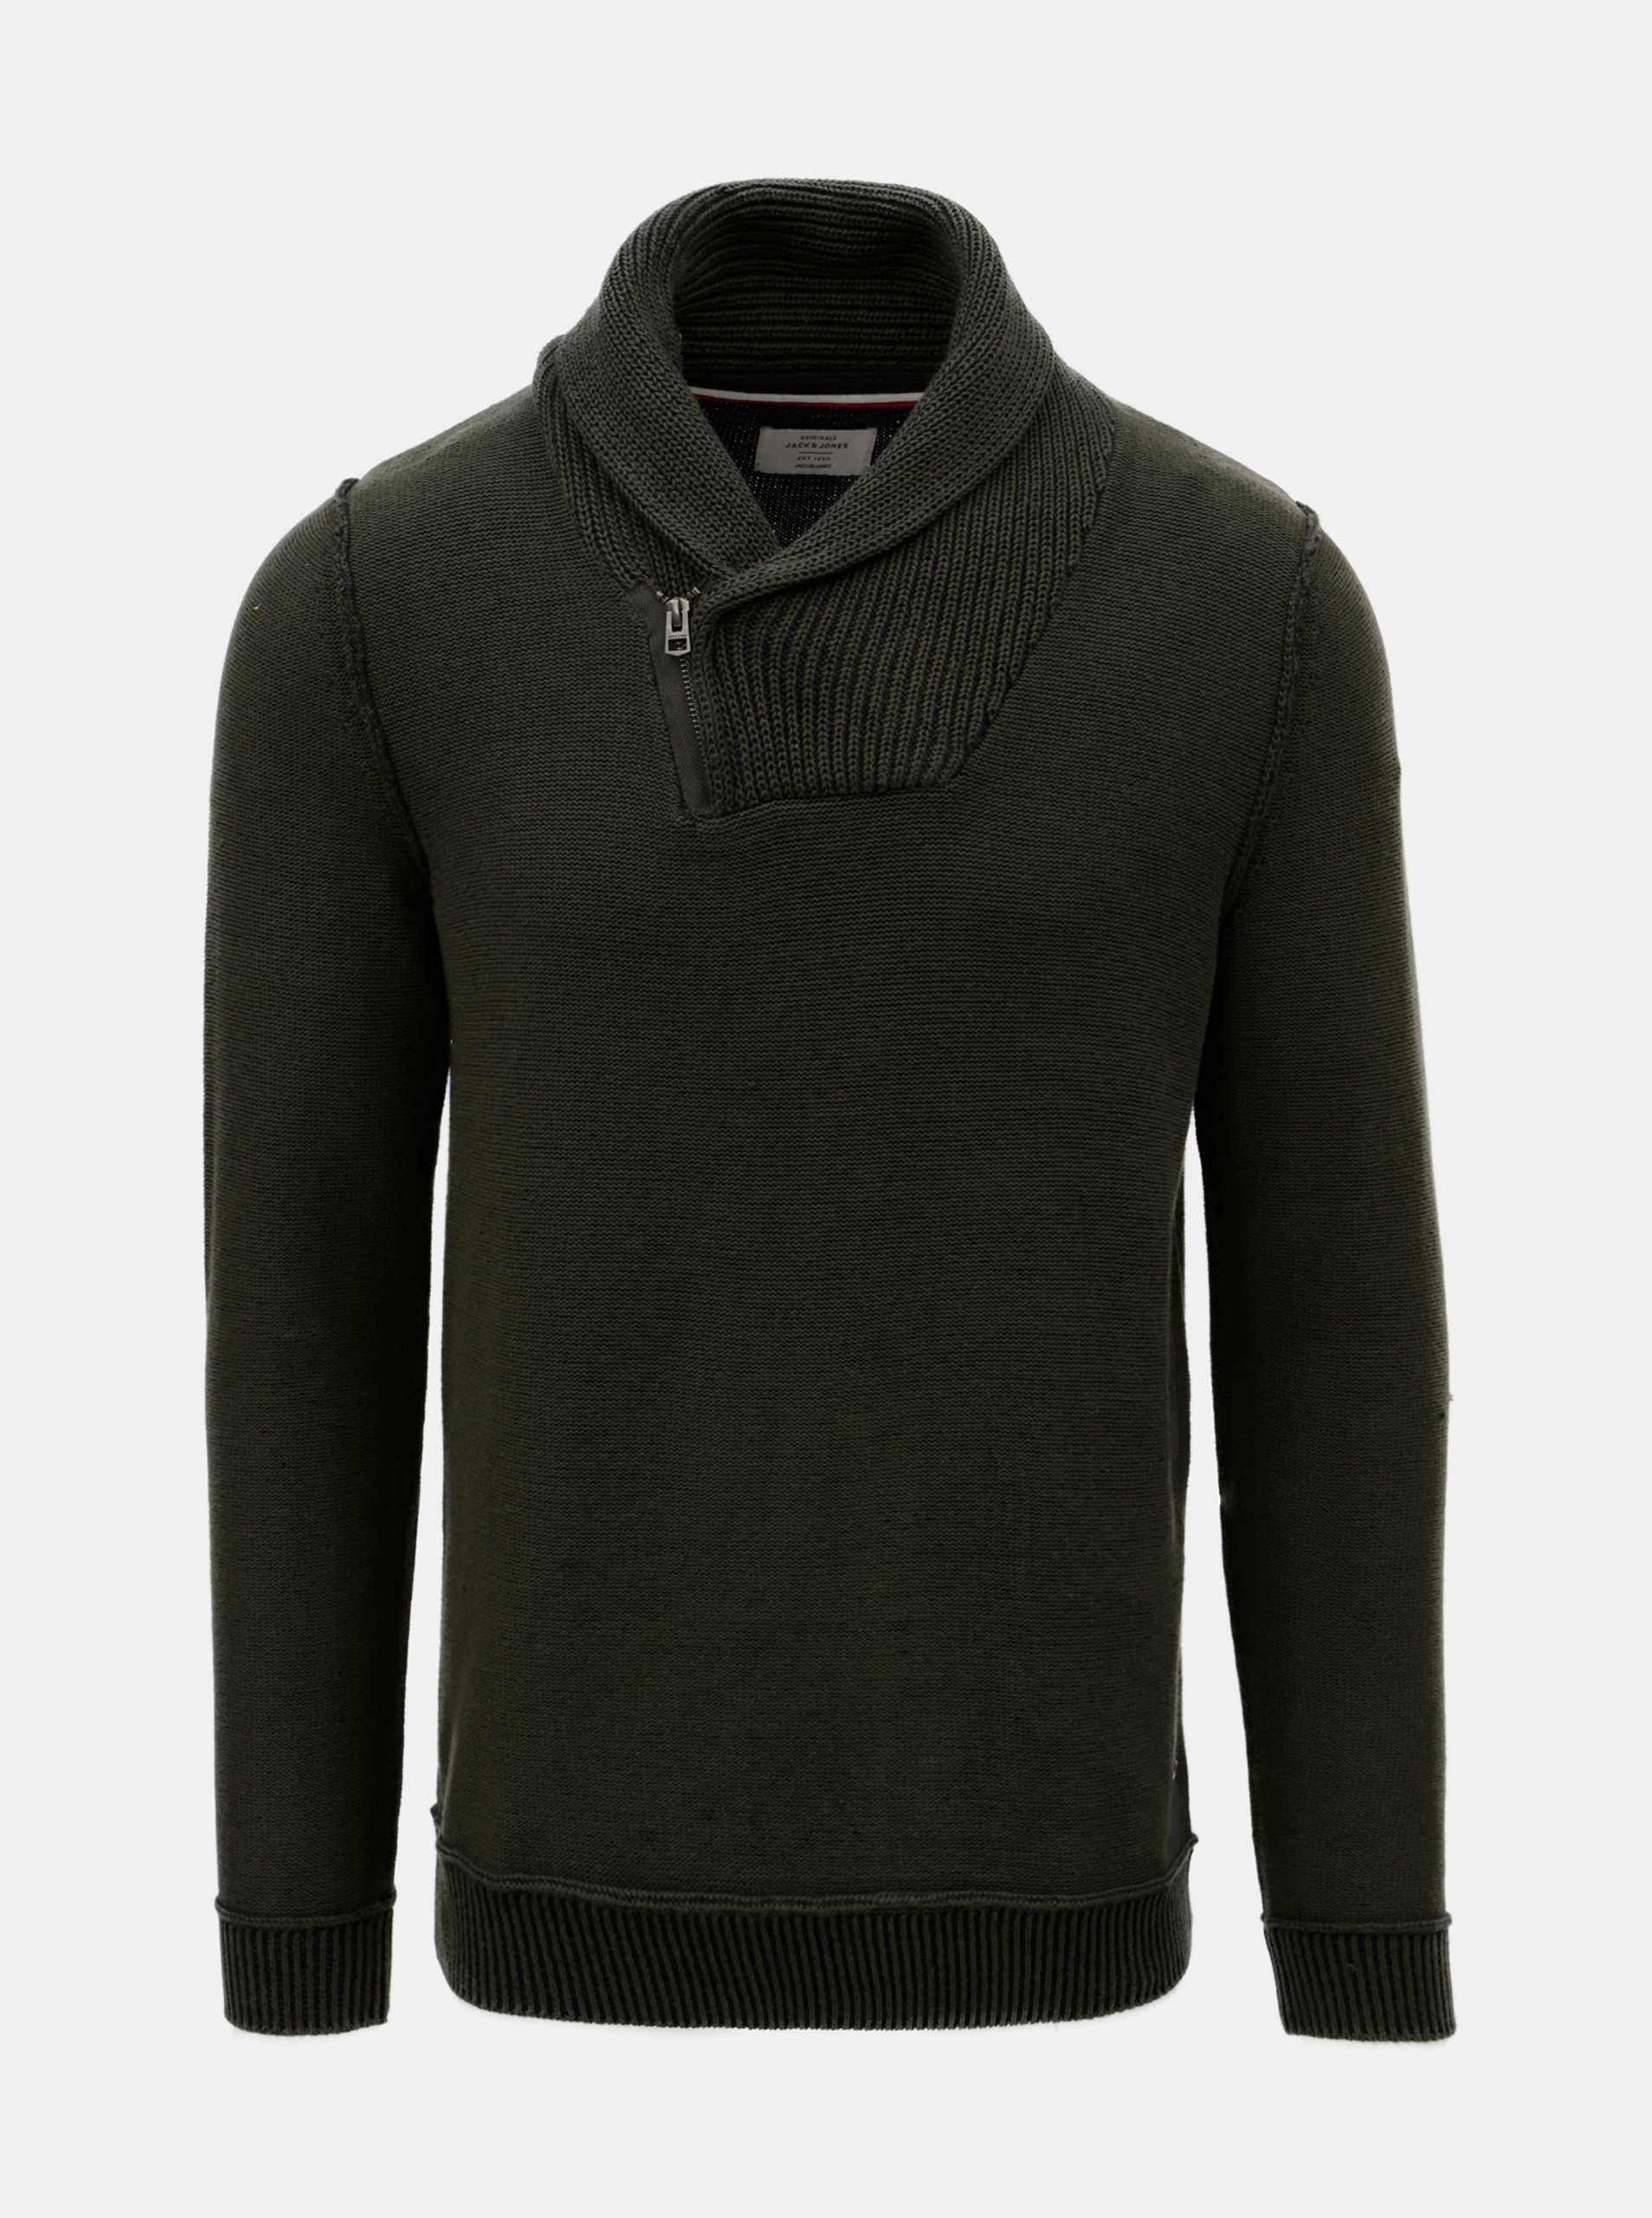 Zelený svetr s límcem Jack & Jones